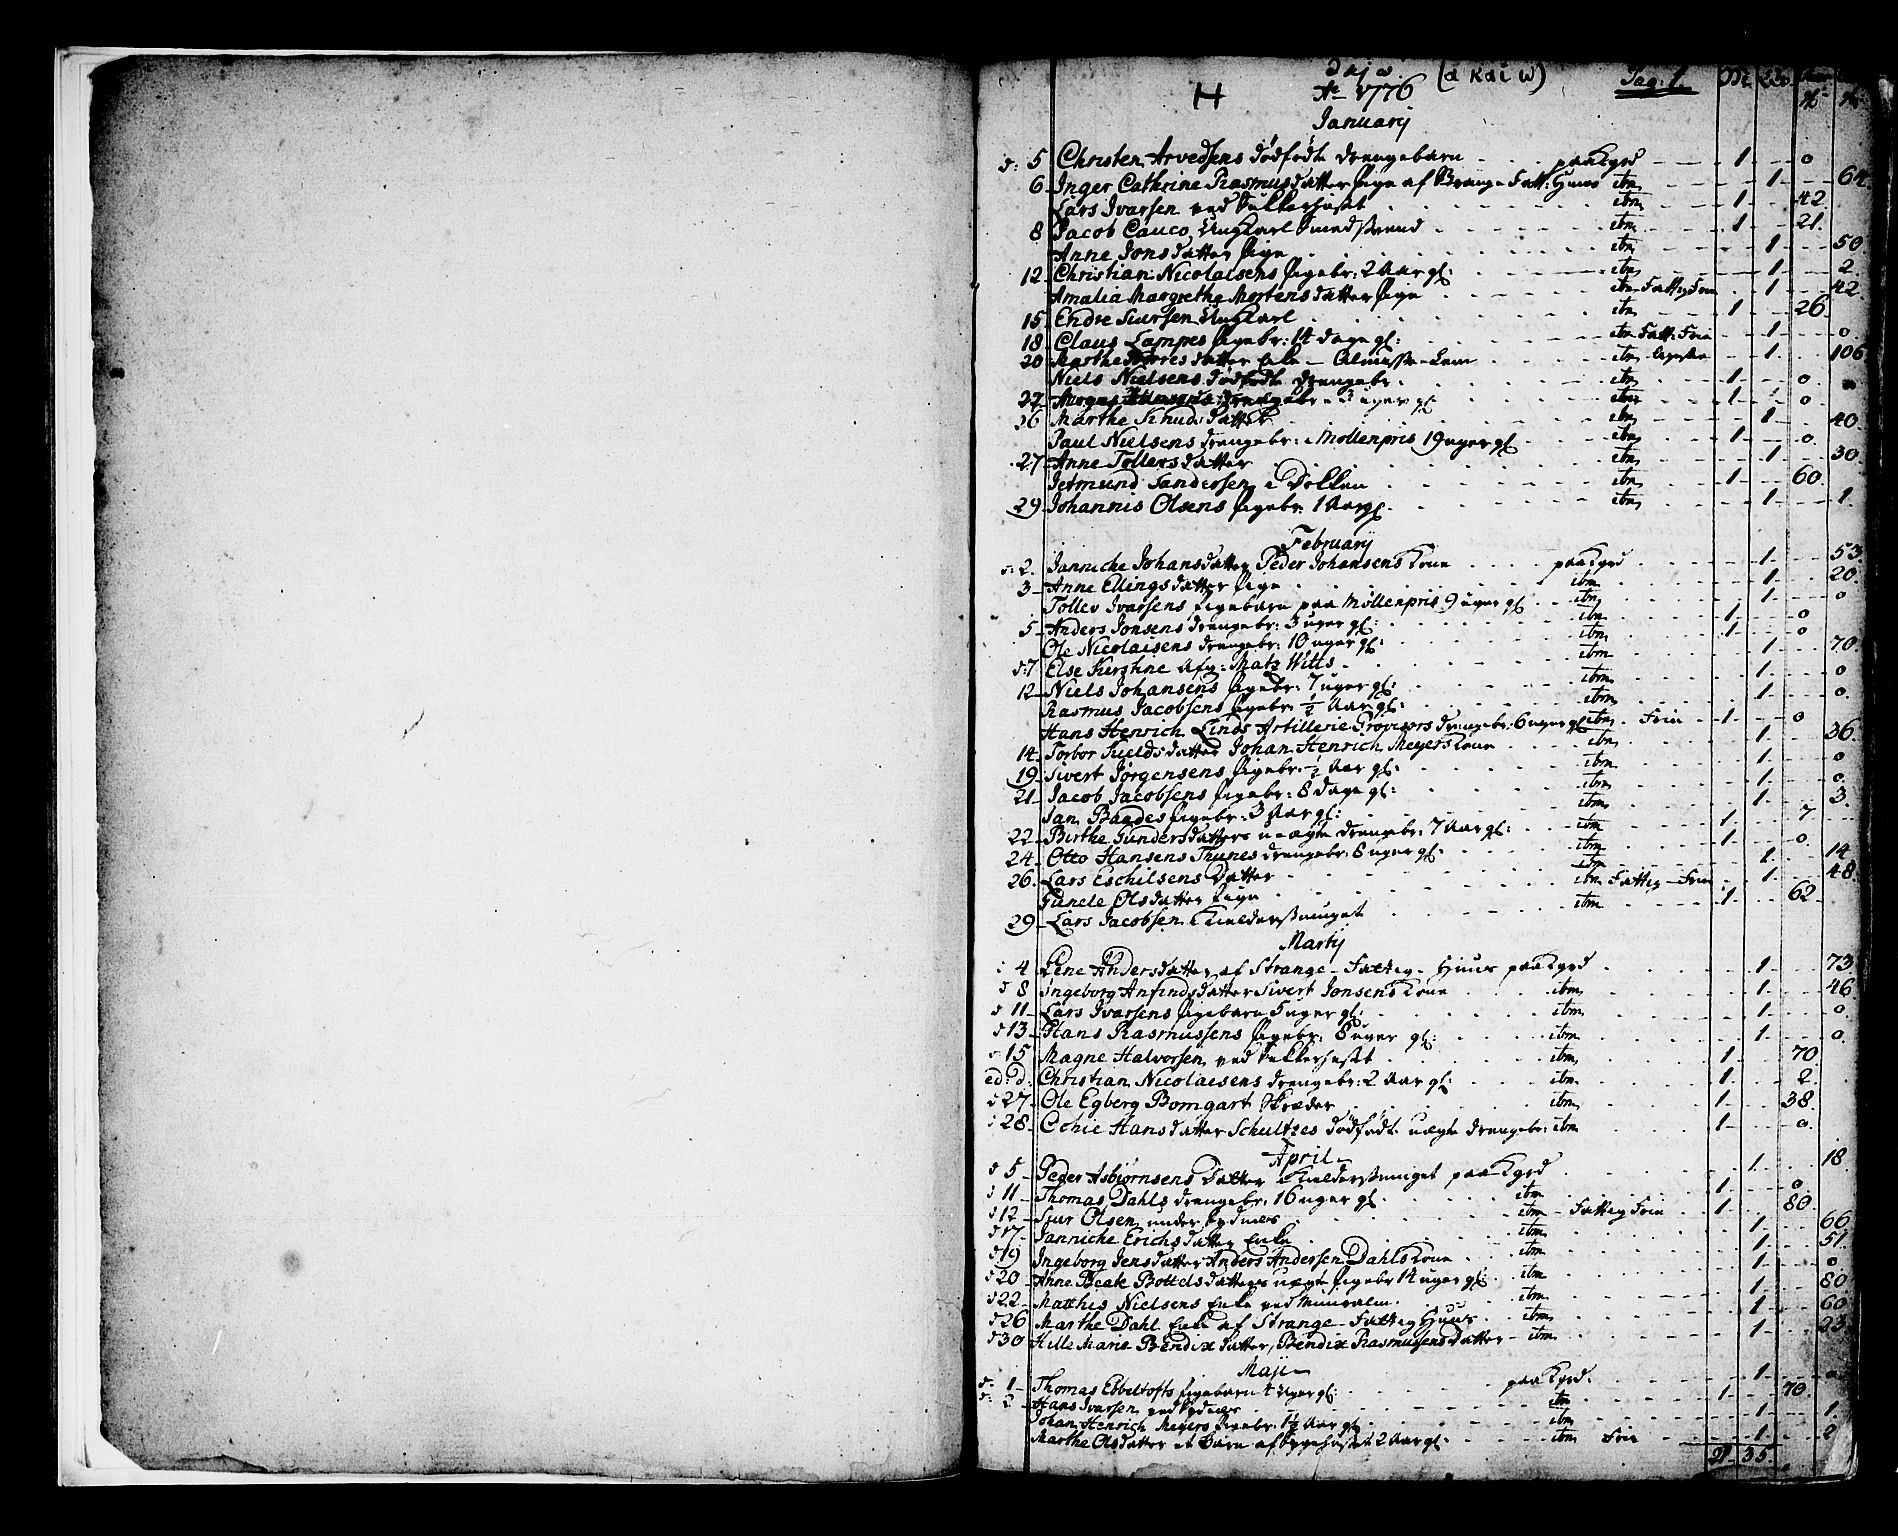 SAB, Domkirken Sokneprestembete, H/Haa/L0009: Ministerialbok nr. A 9, 1776-1821, s. 0-1